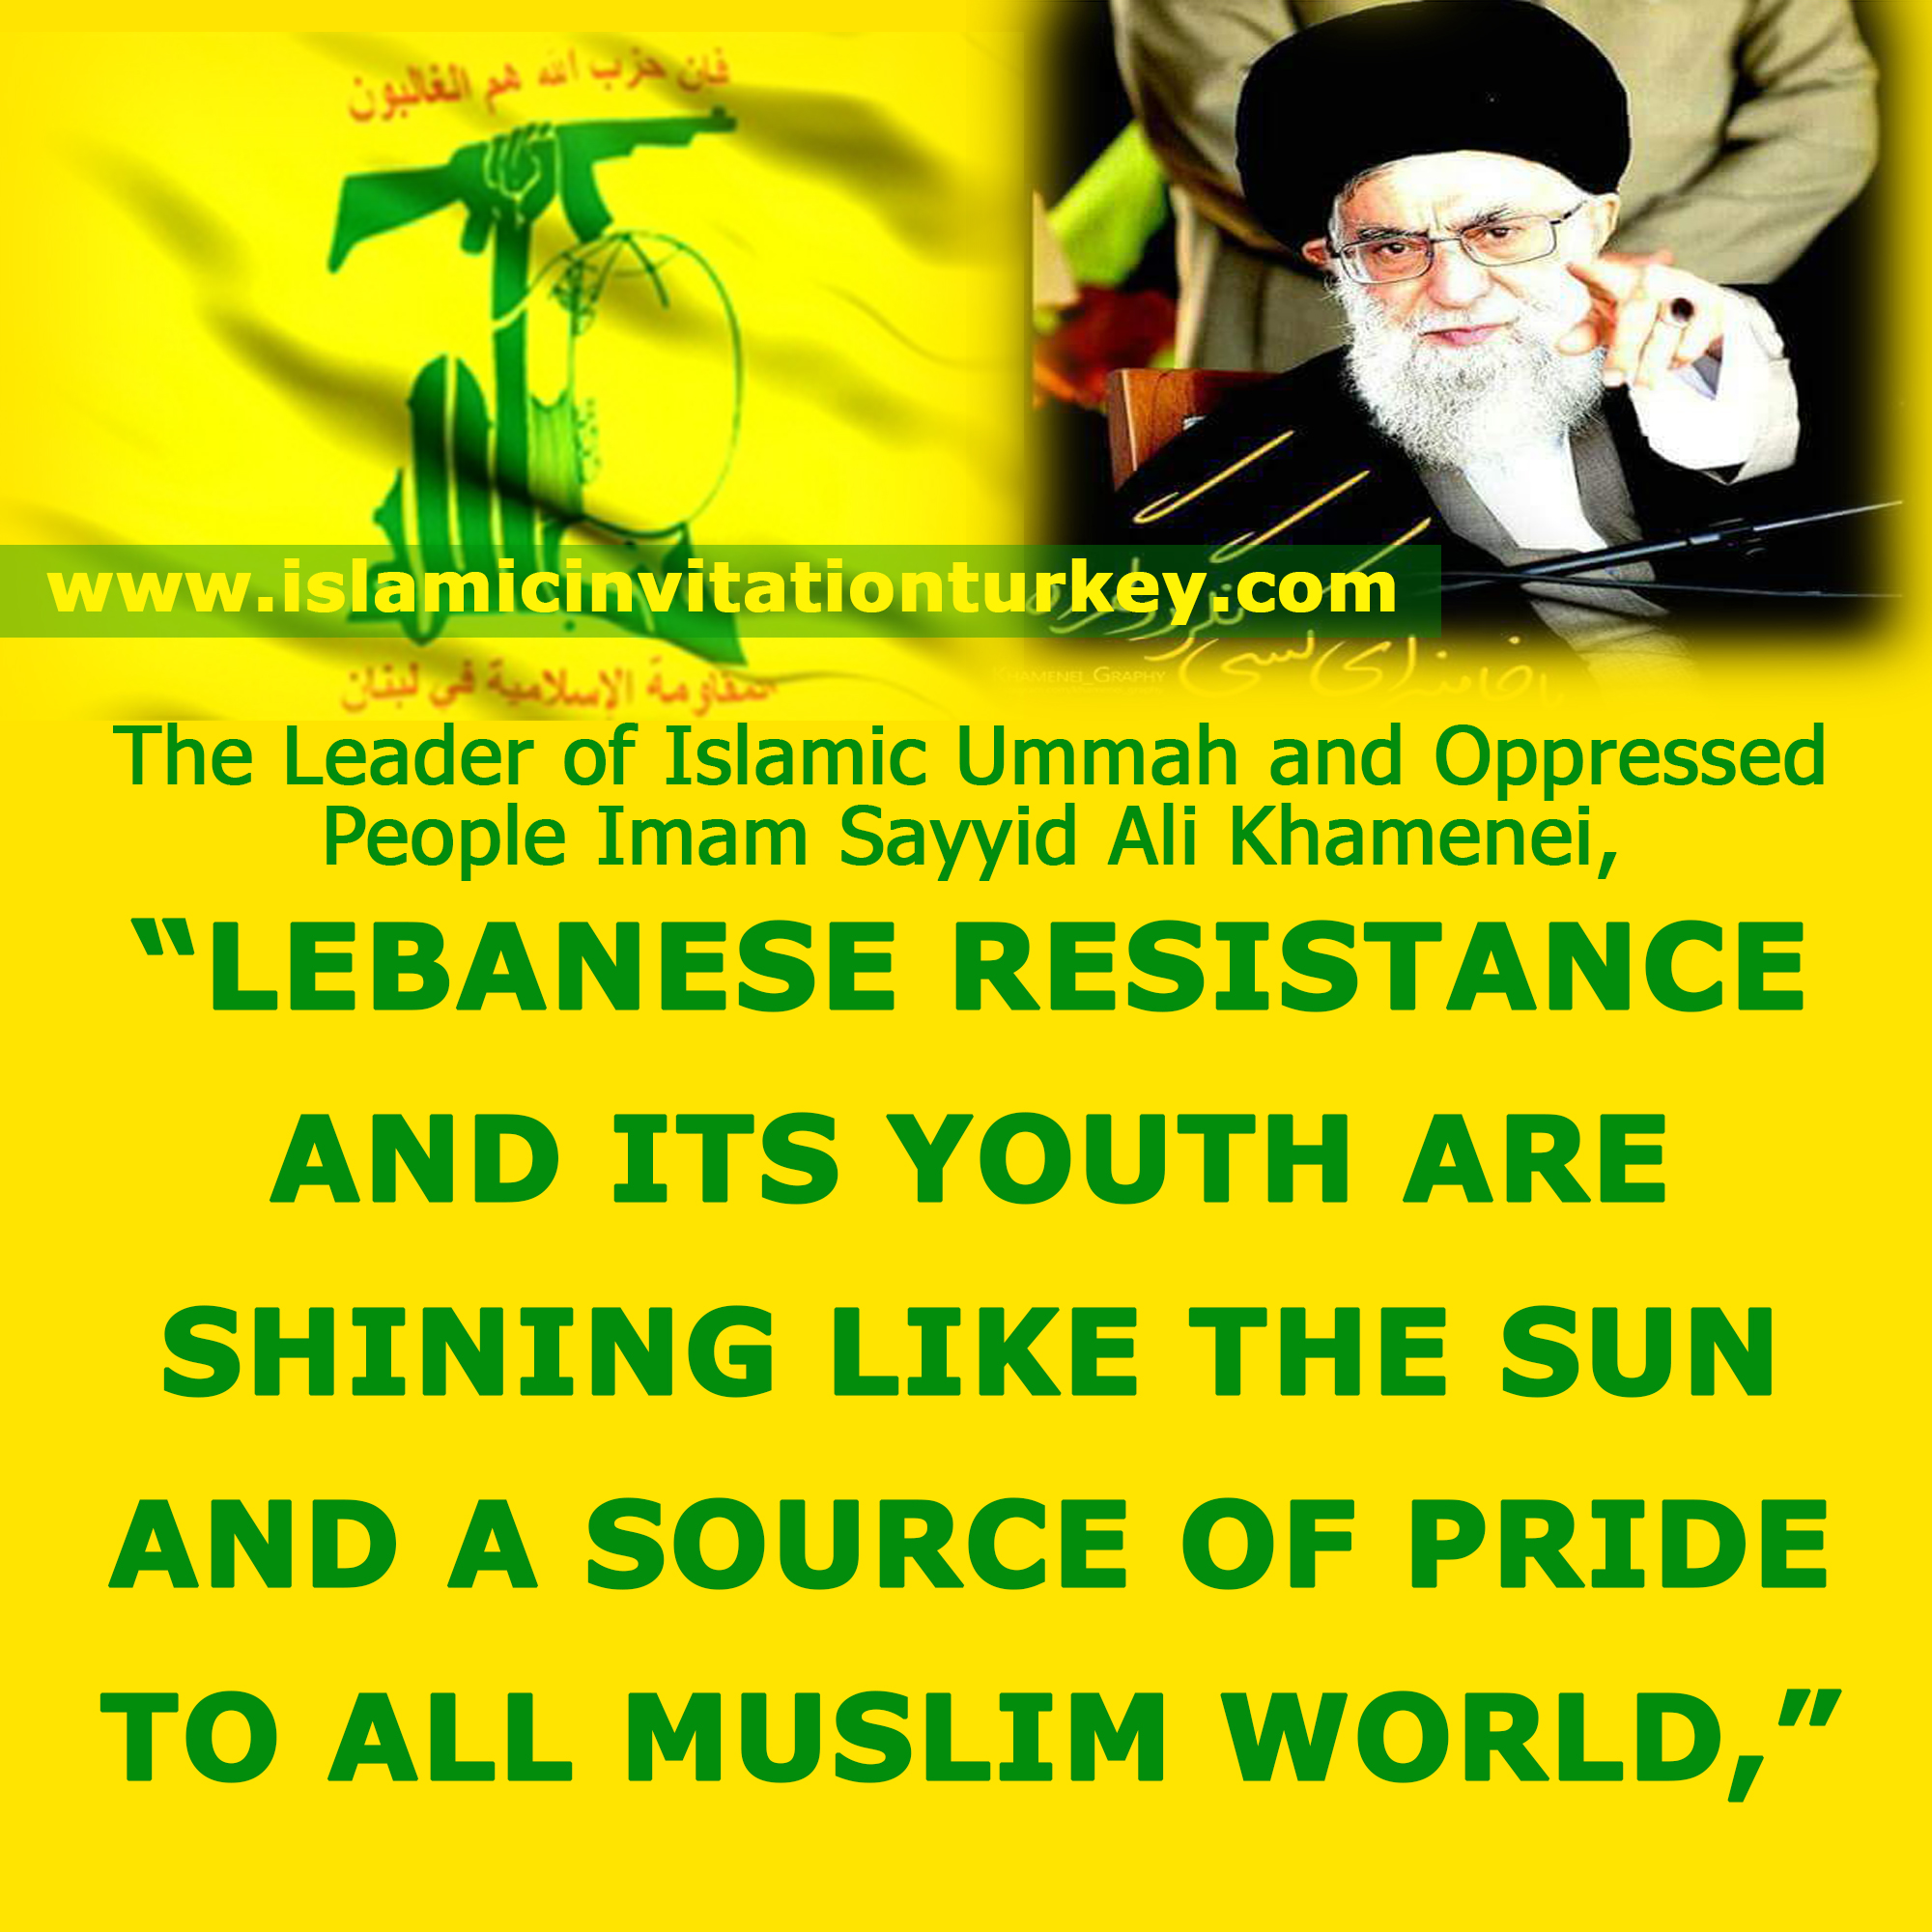 lebanese resistance